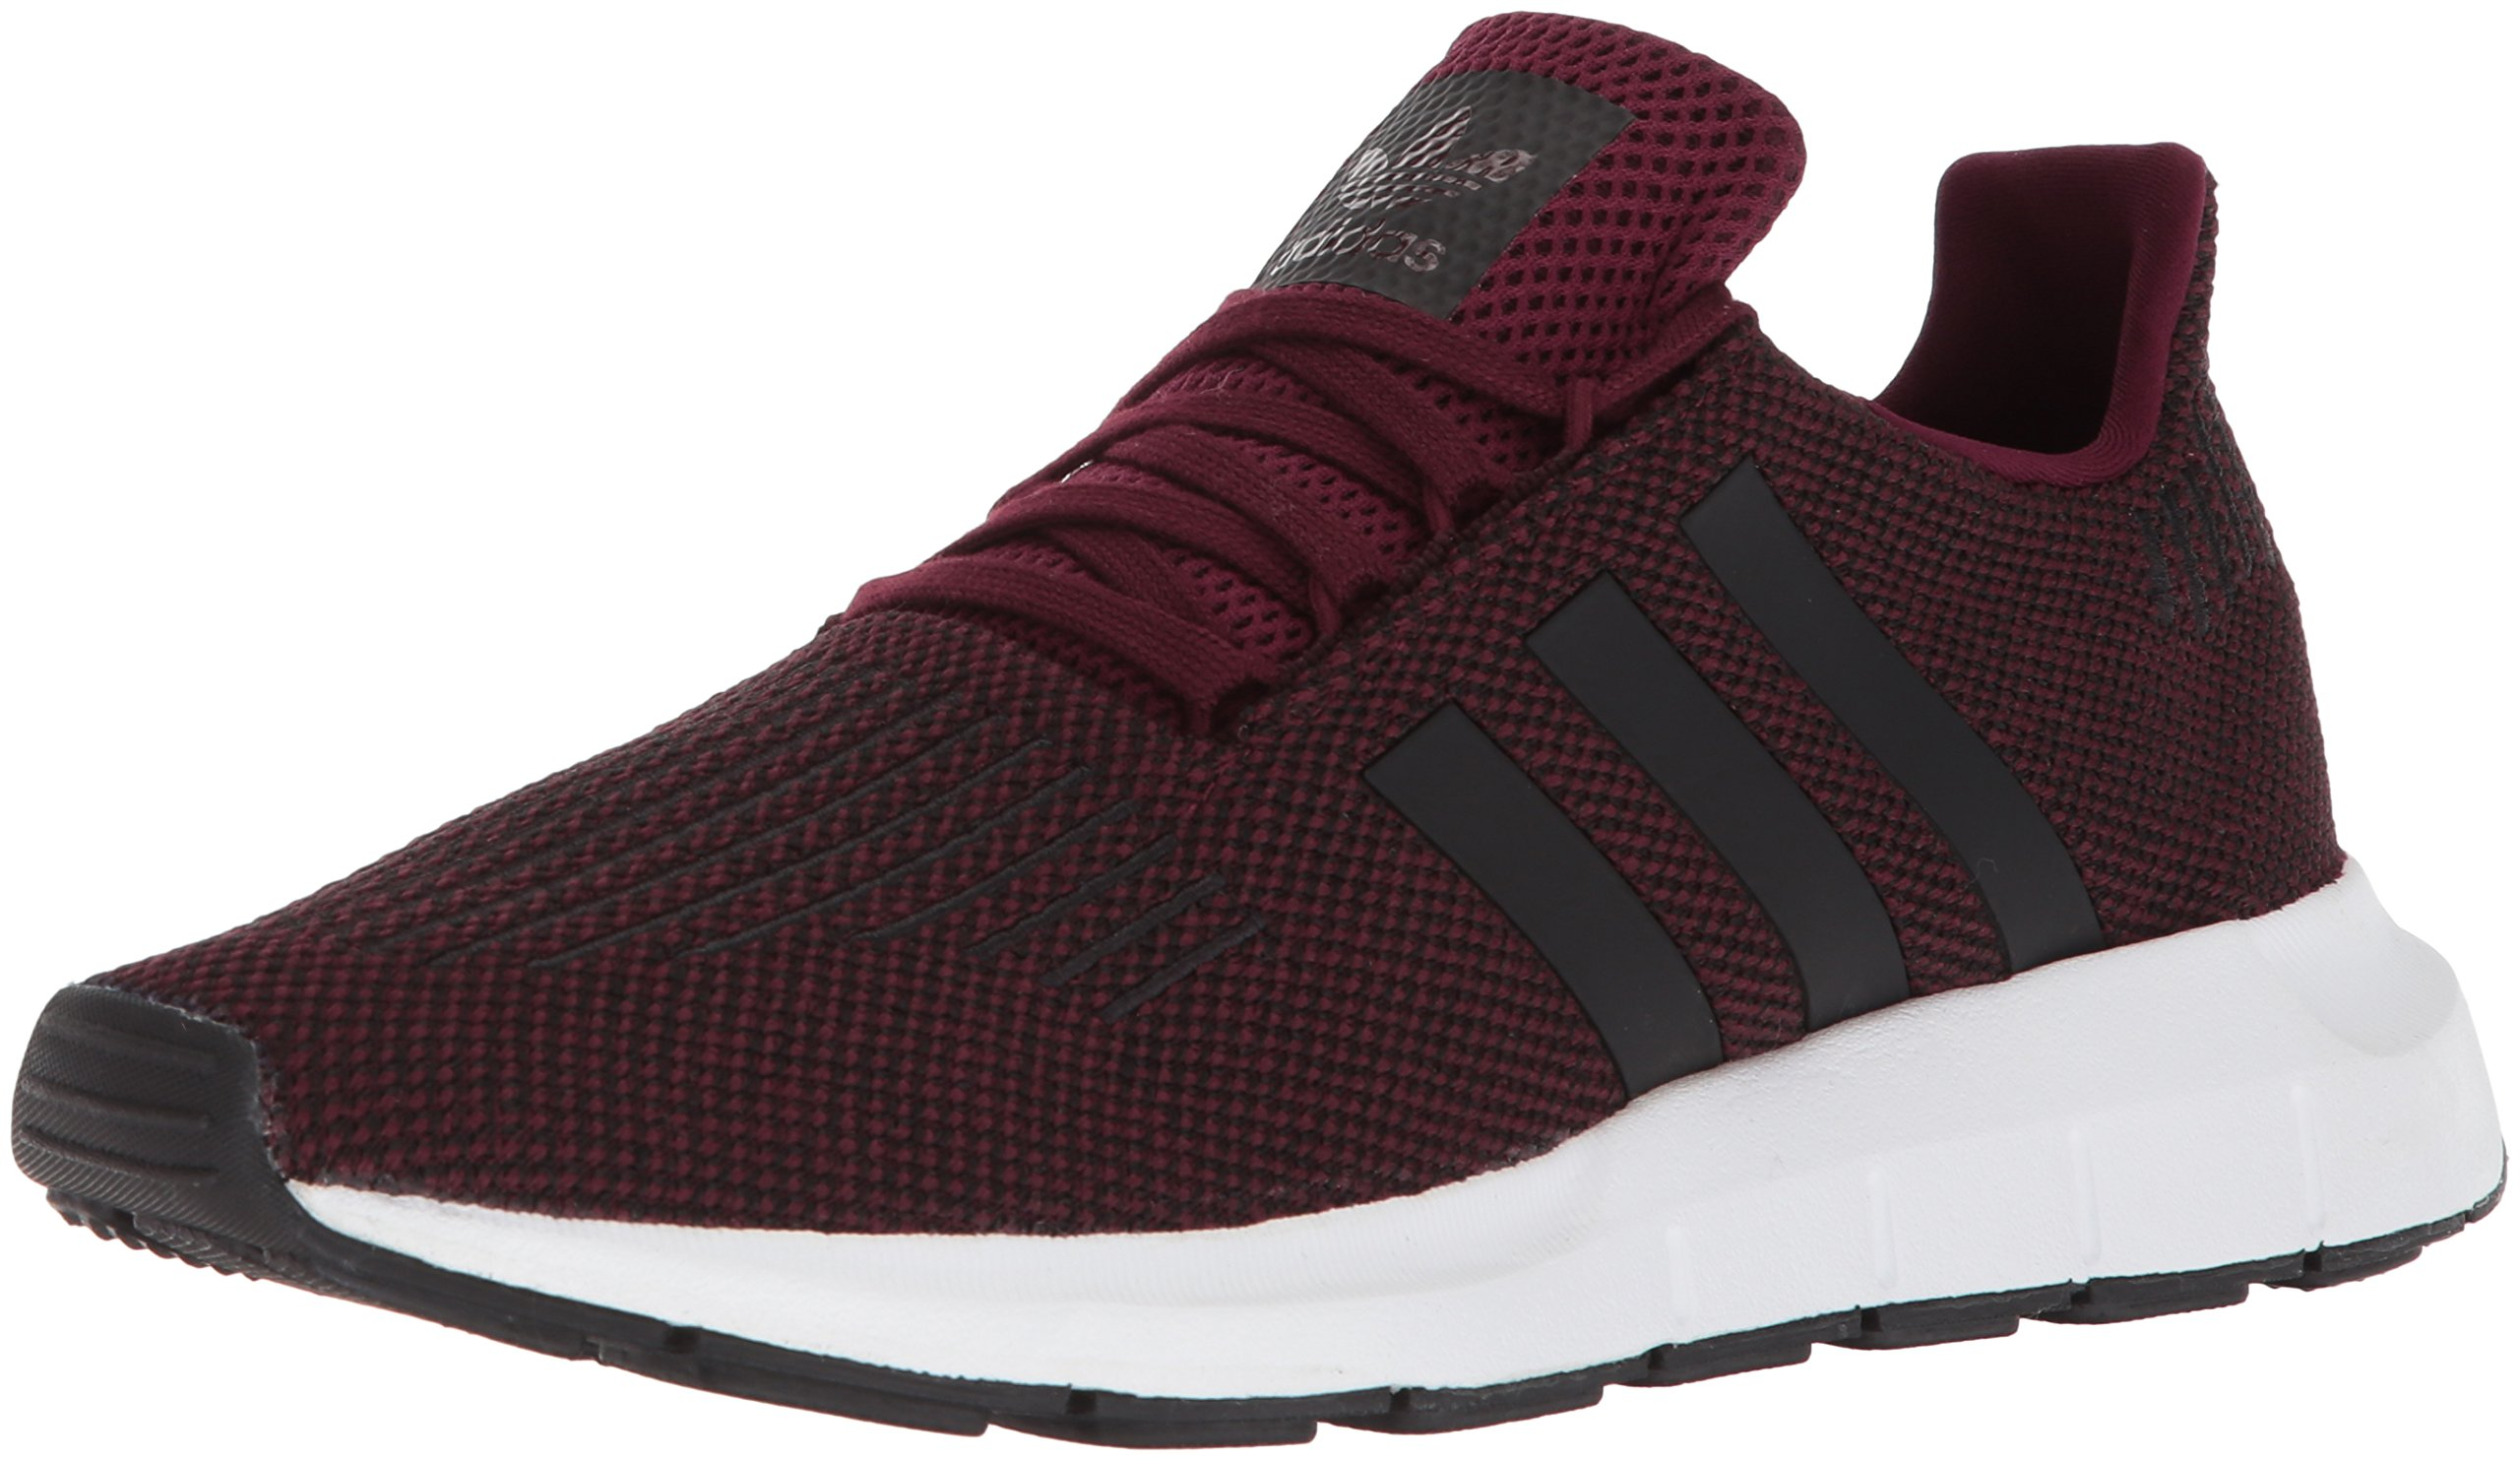 22f3b584d895a Galleon - Adidas Men s Swift Run Shoes